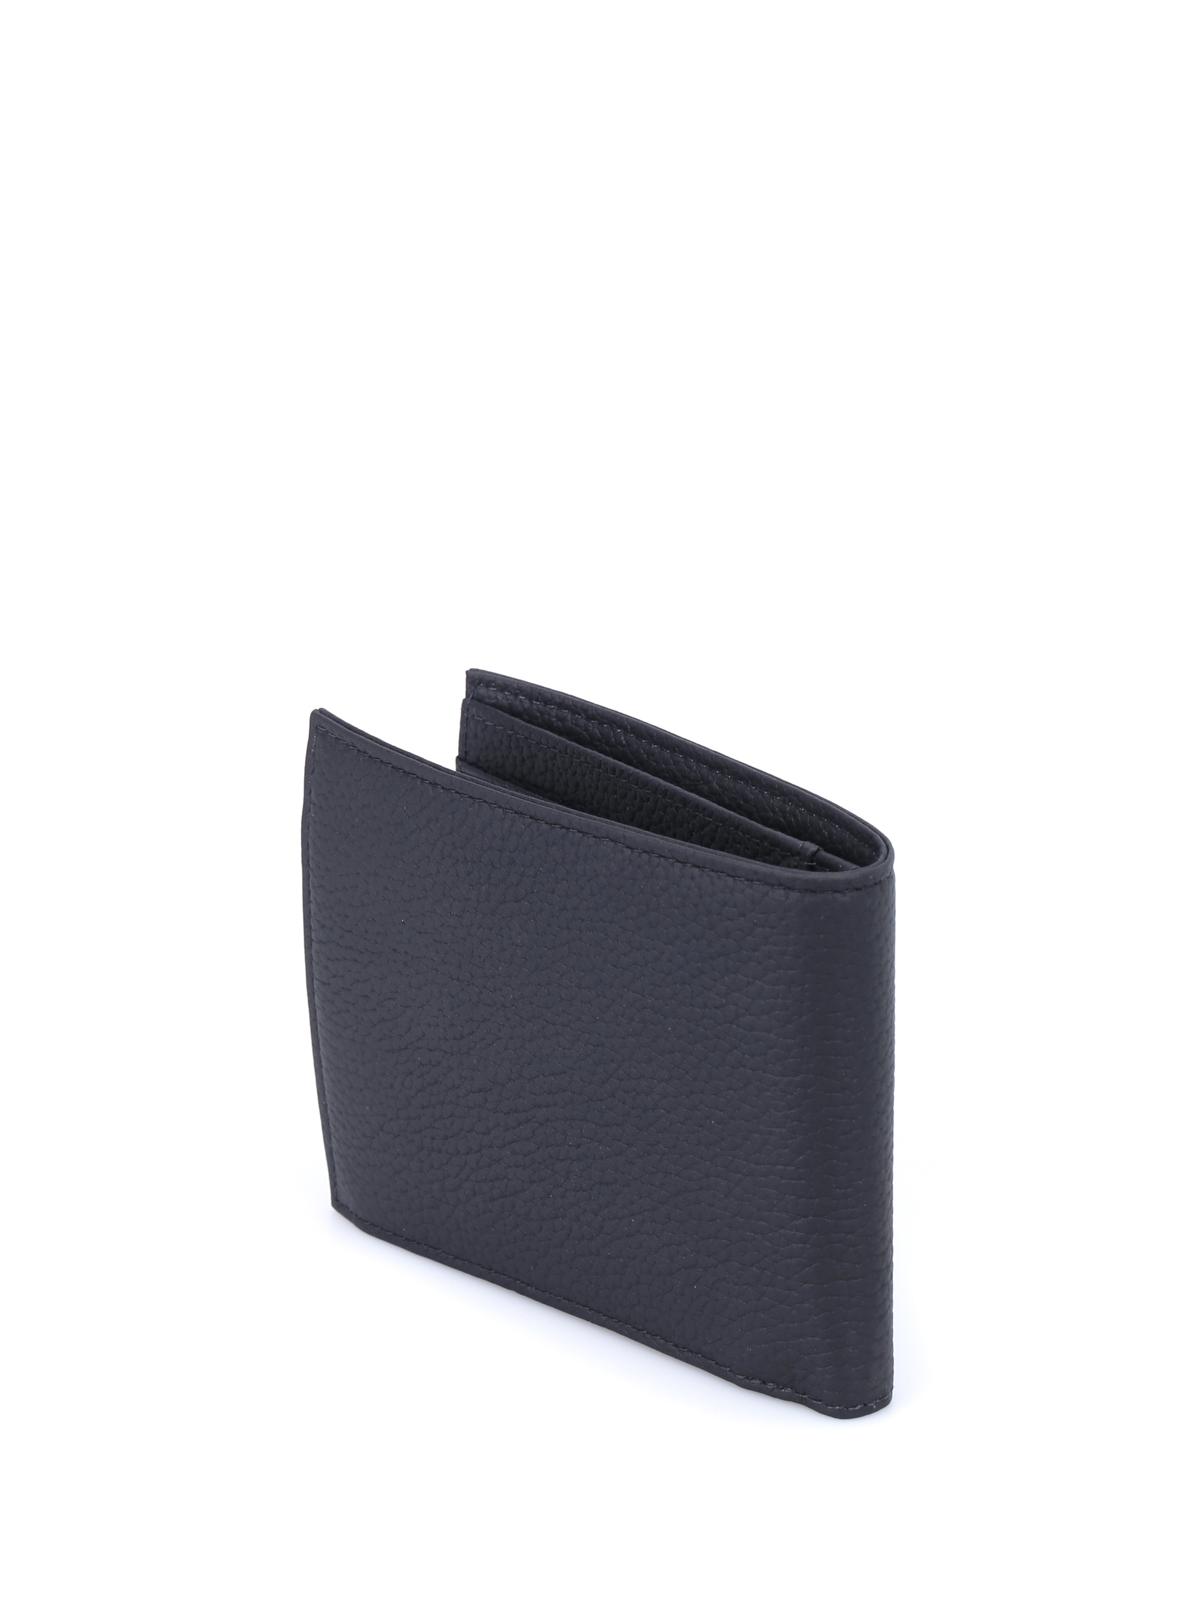 f656870c6f Emporio Armani - Black grainy leather bi-fold wallet - wallets ...